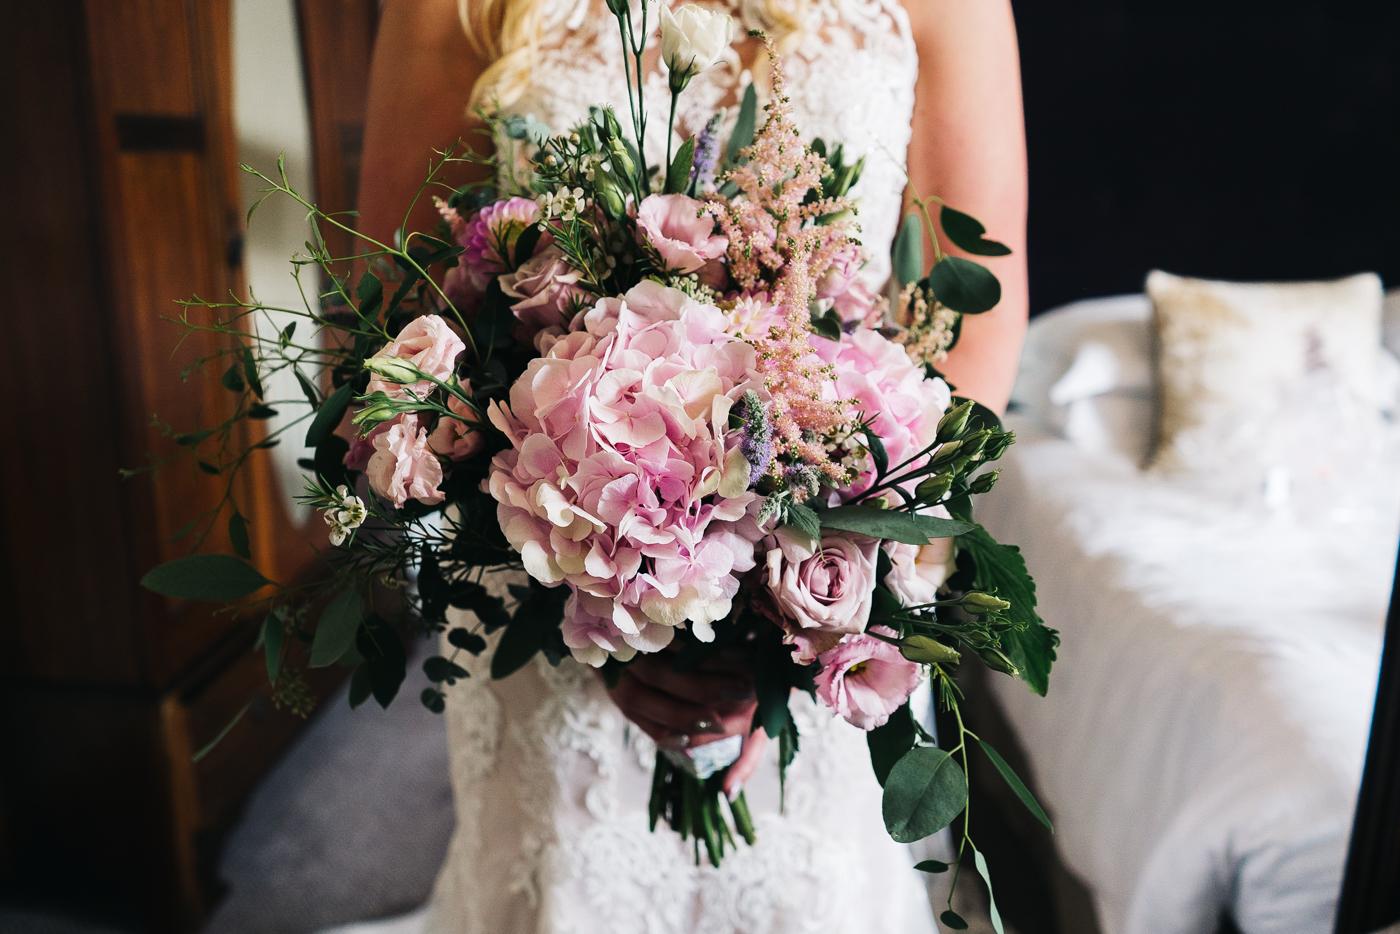 headlame-hall-north-yorkshire-north-east-photographer-wedding-0015.jpg